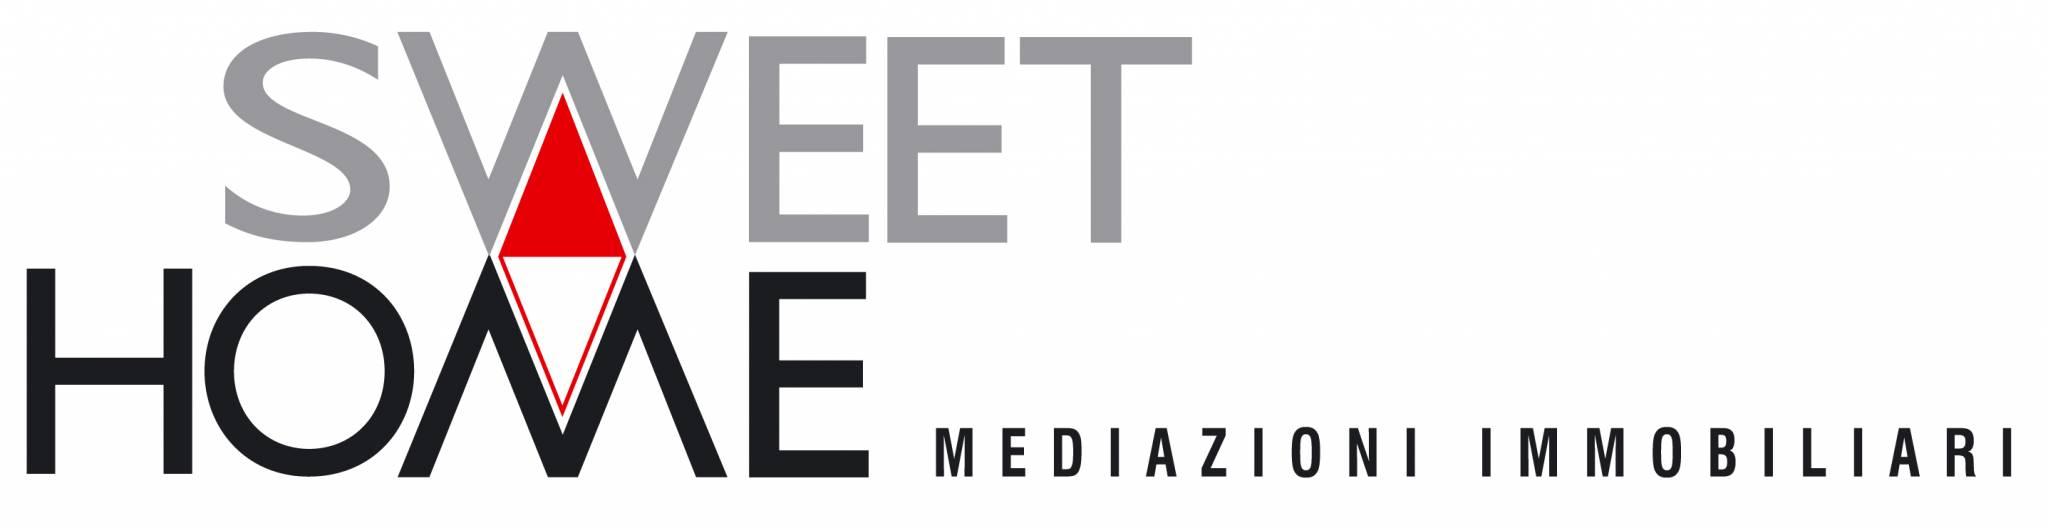 Sweet Home Mediazioni Immobiliari